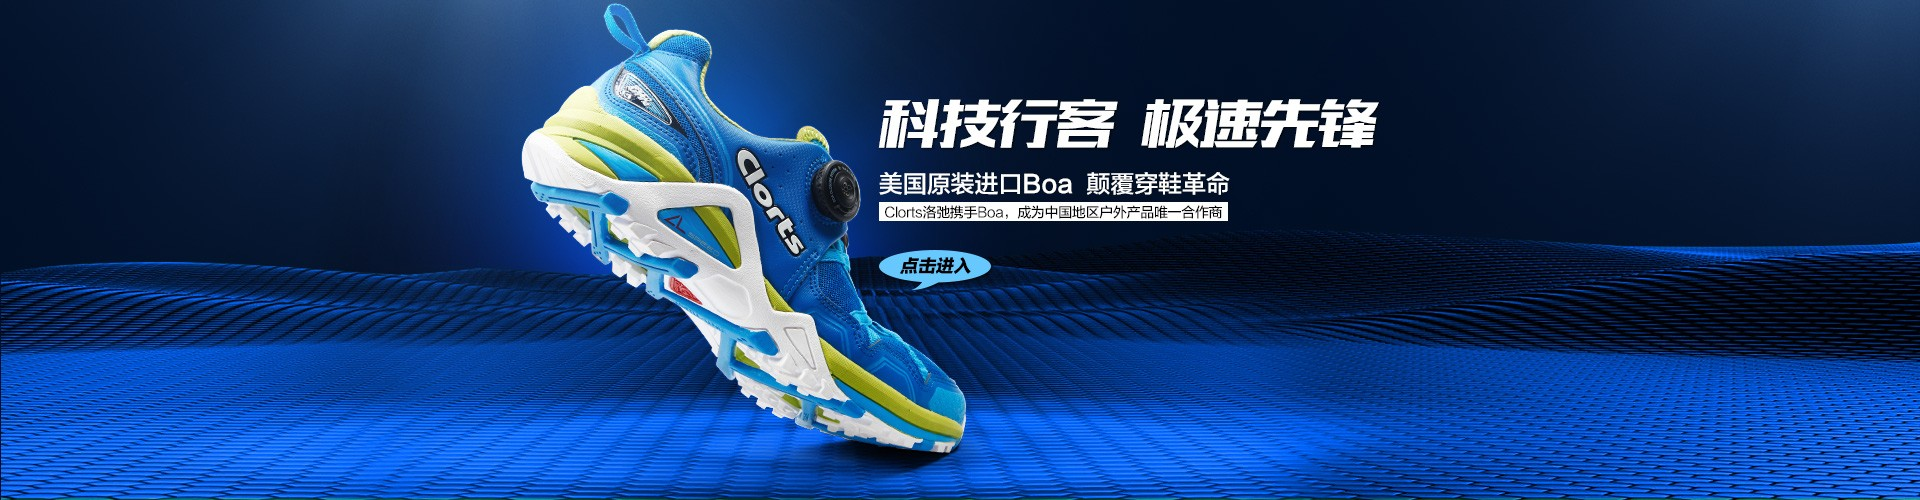 Clorts洛弛Boa变速户外鞋【CL SPEED风速】全世界首发